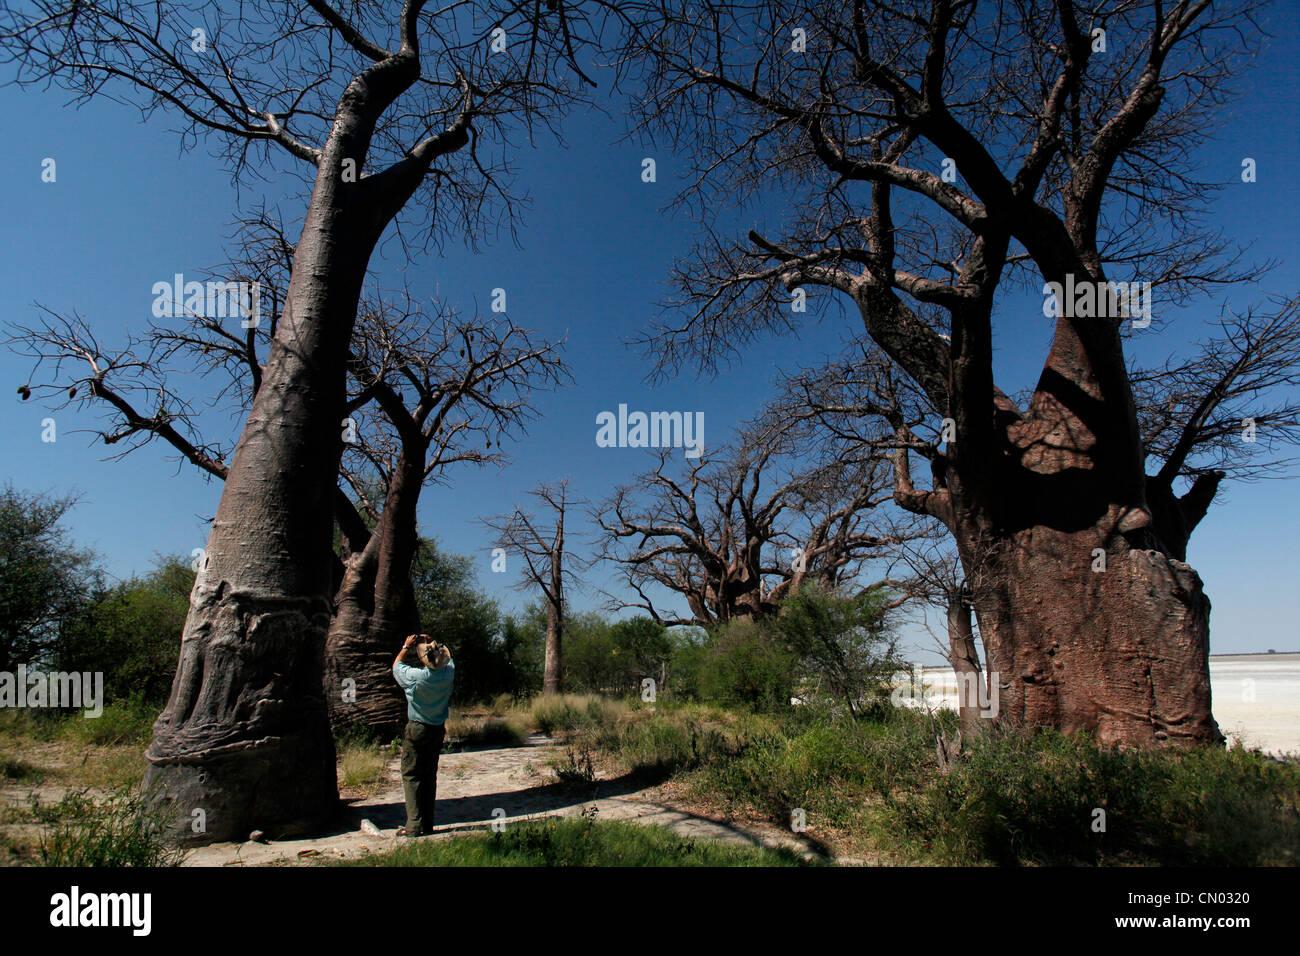 A tourist photographs Thomas Baines baobabs in Nxai national park in Botswana. - Stock Image